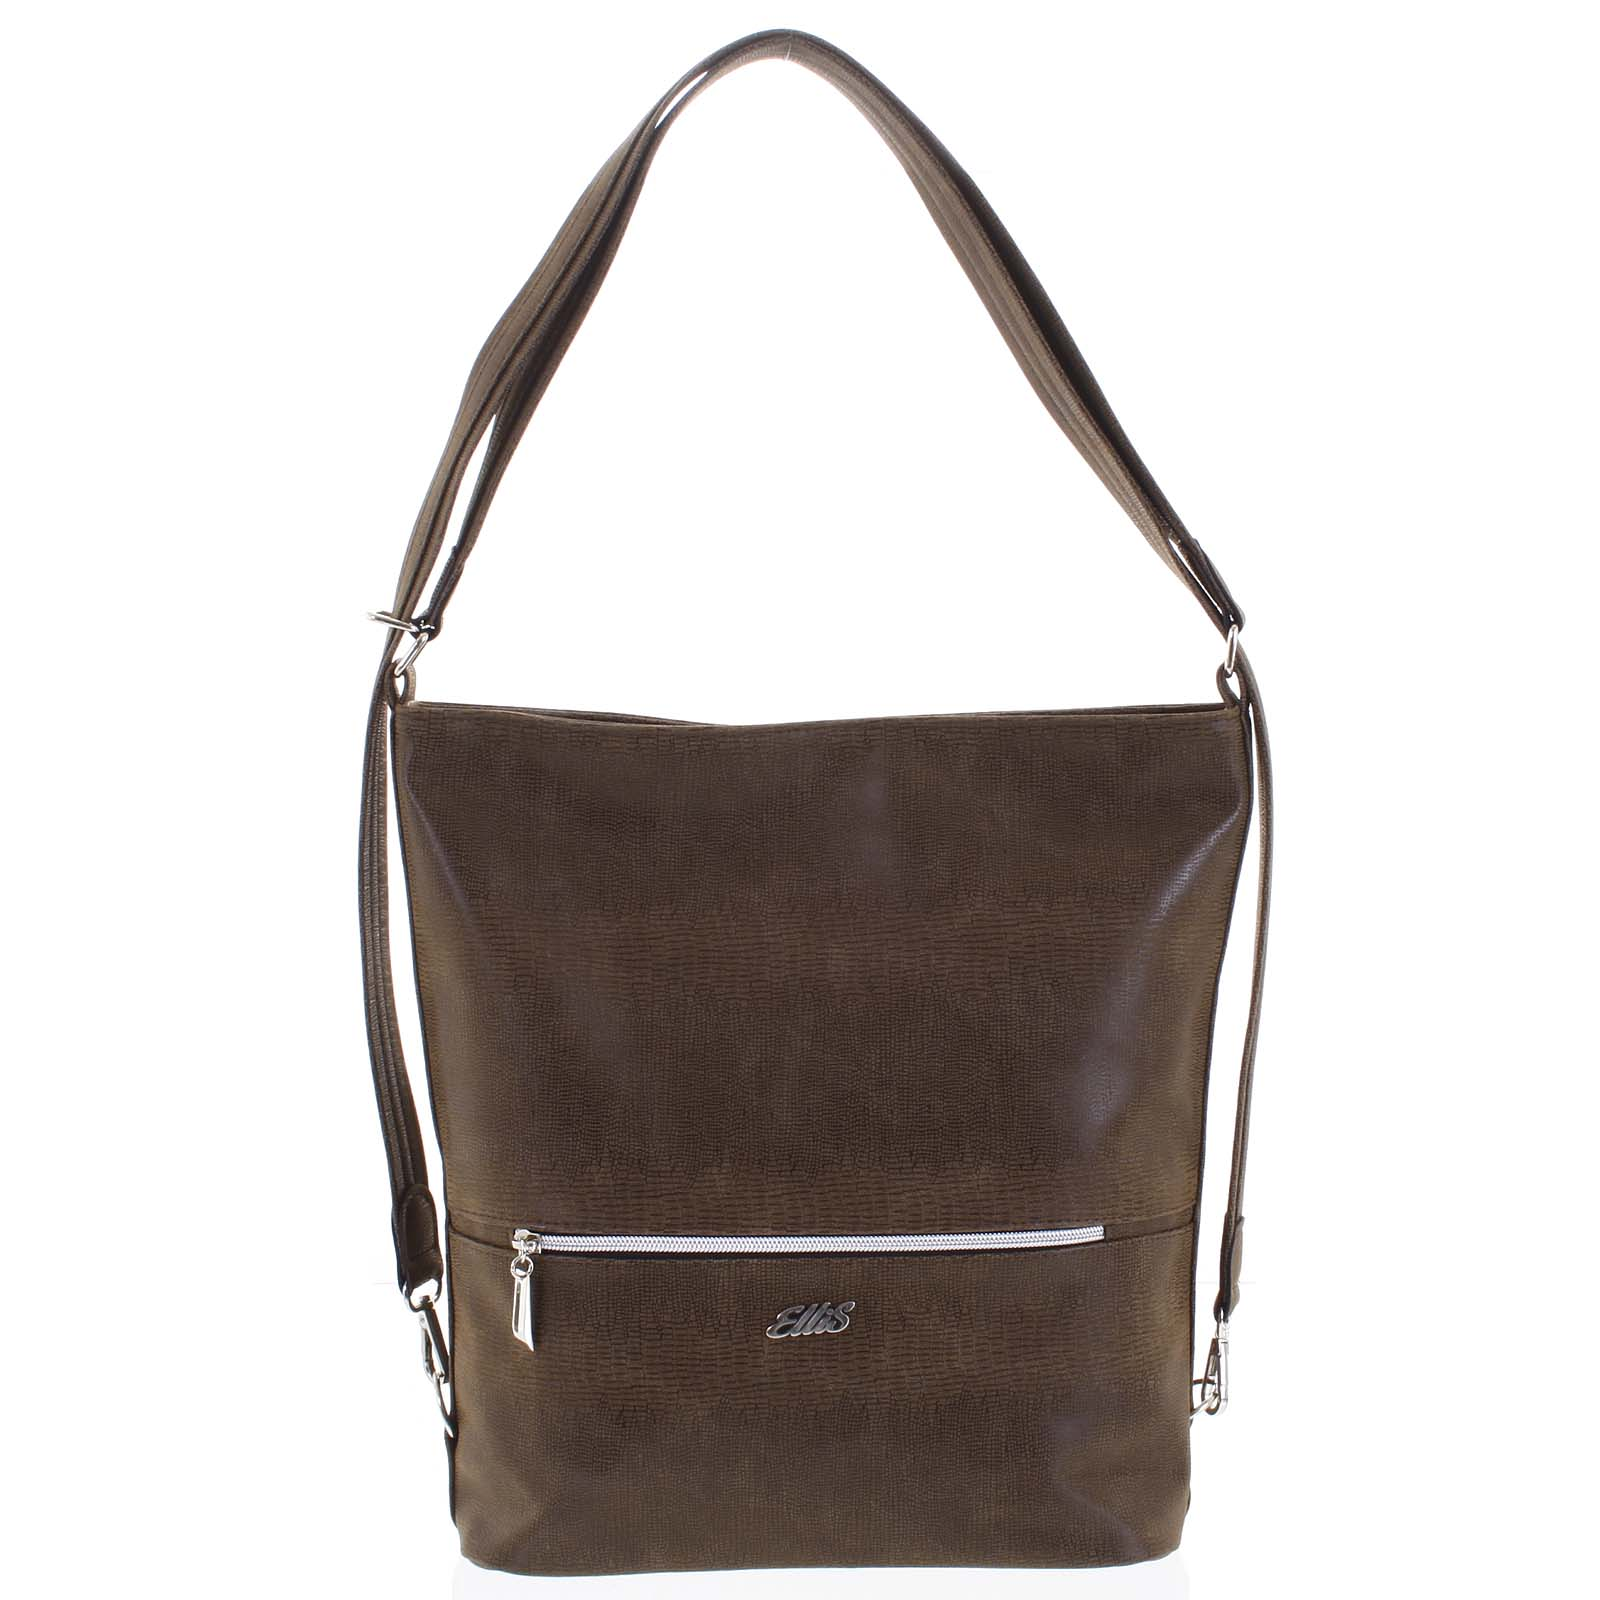 Módní dámská kabelka batoh hnědá se vzorem - Ellis Patrik